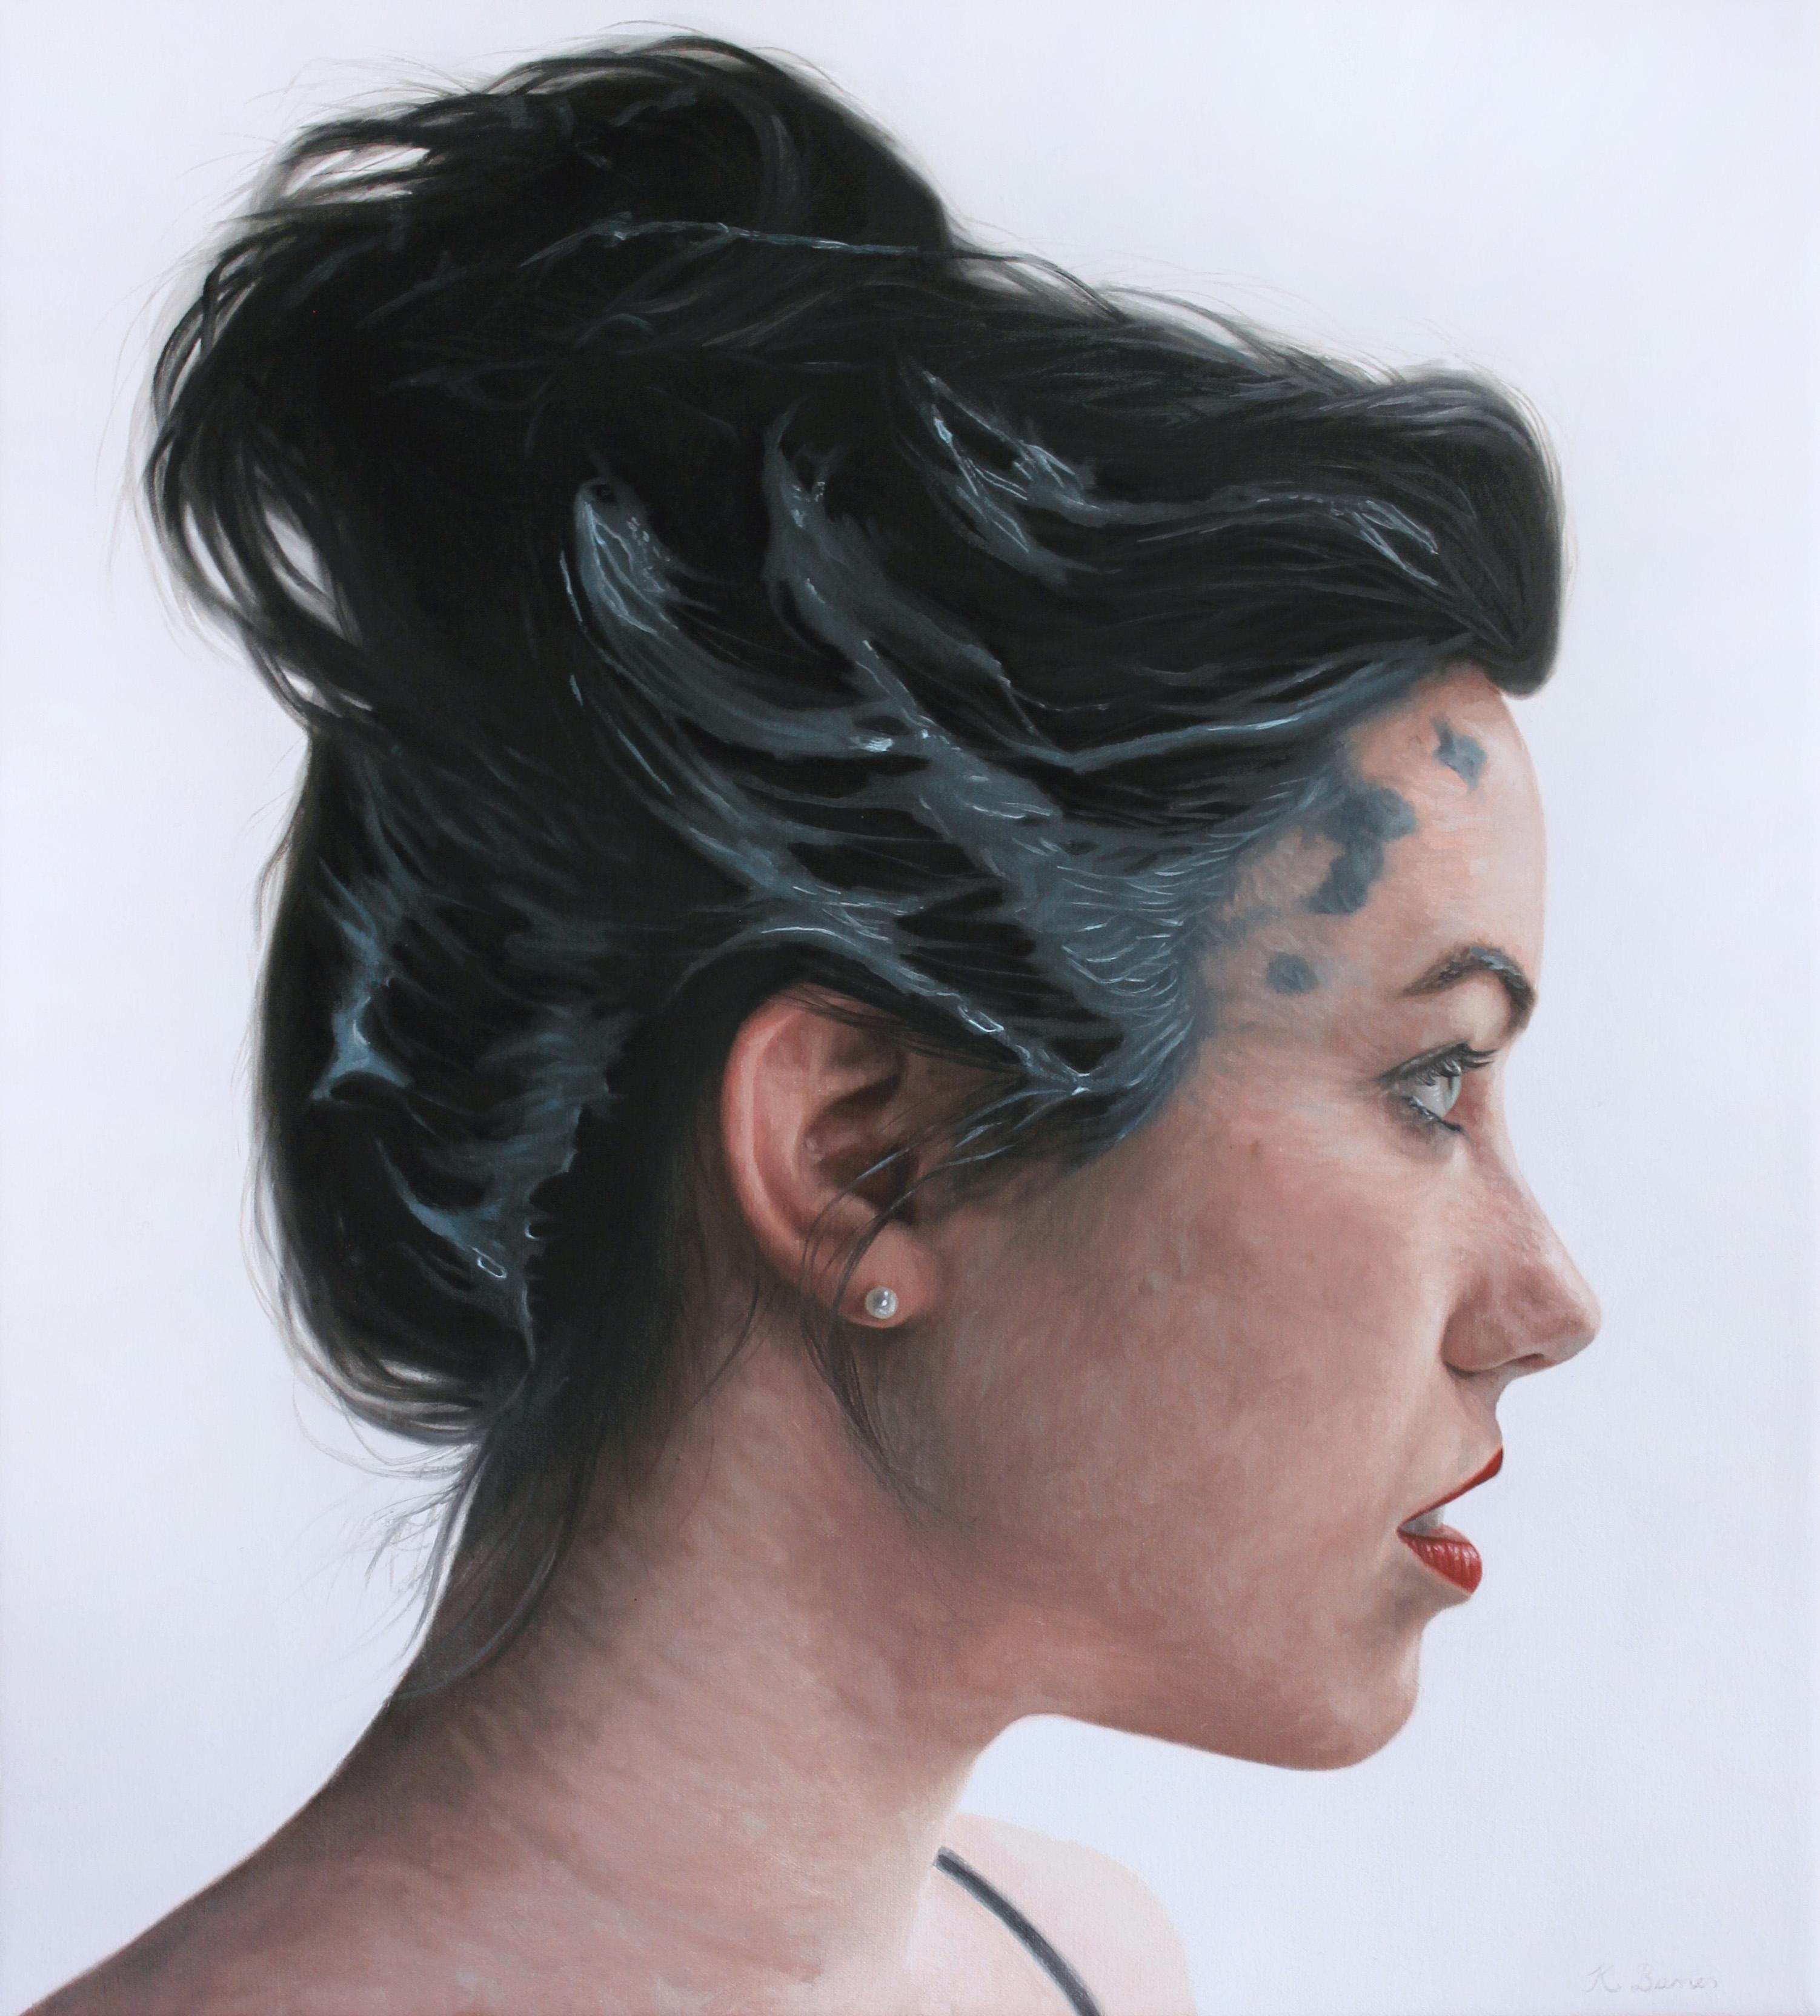 'Woman with blue paint on hair II' Kyle Barnes, 45x50cm, Oil on canvas